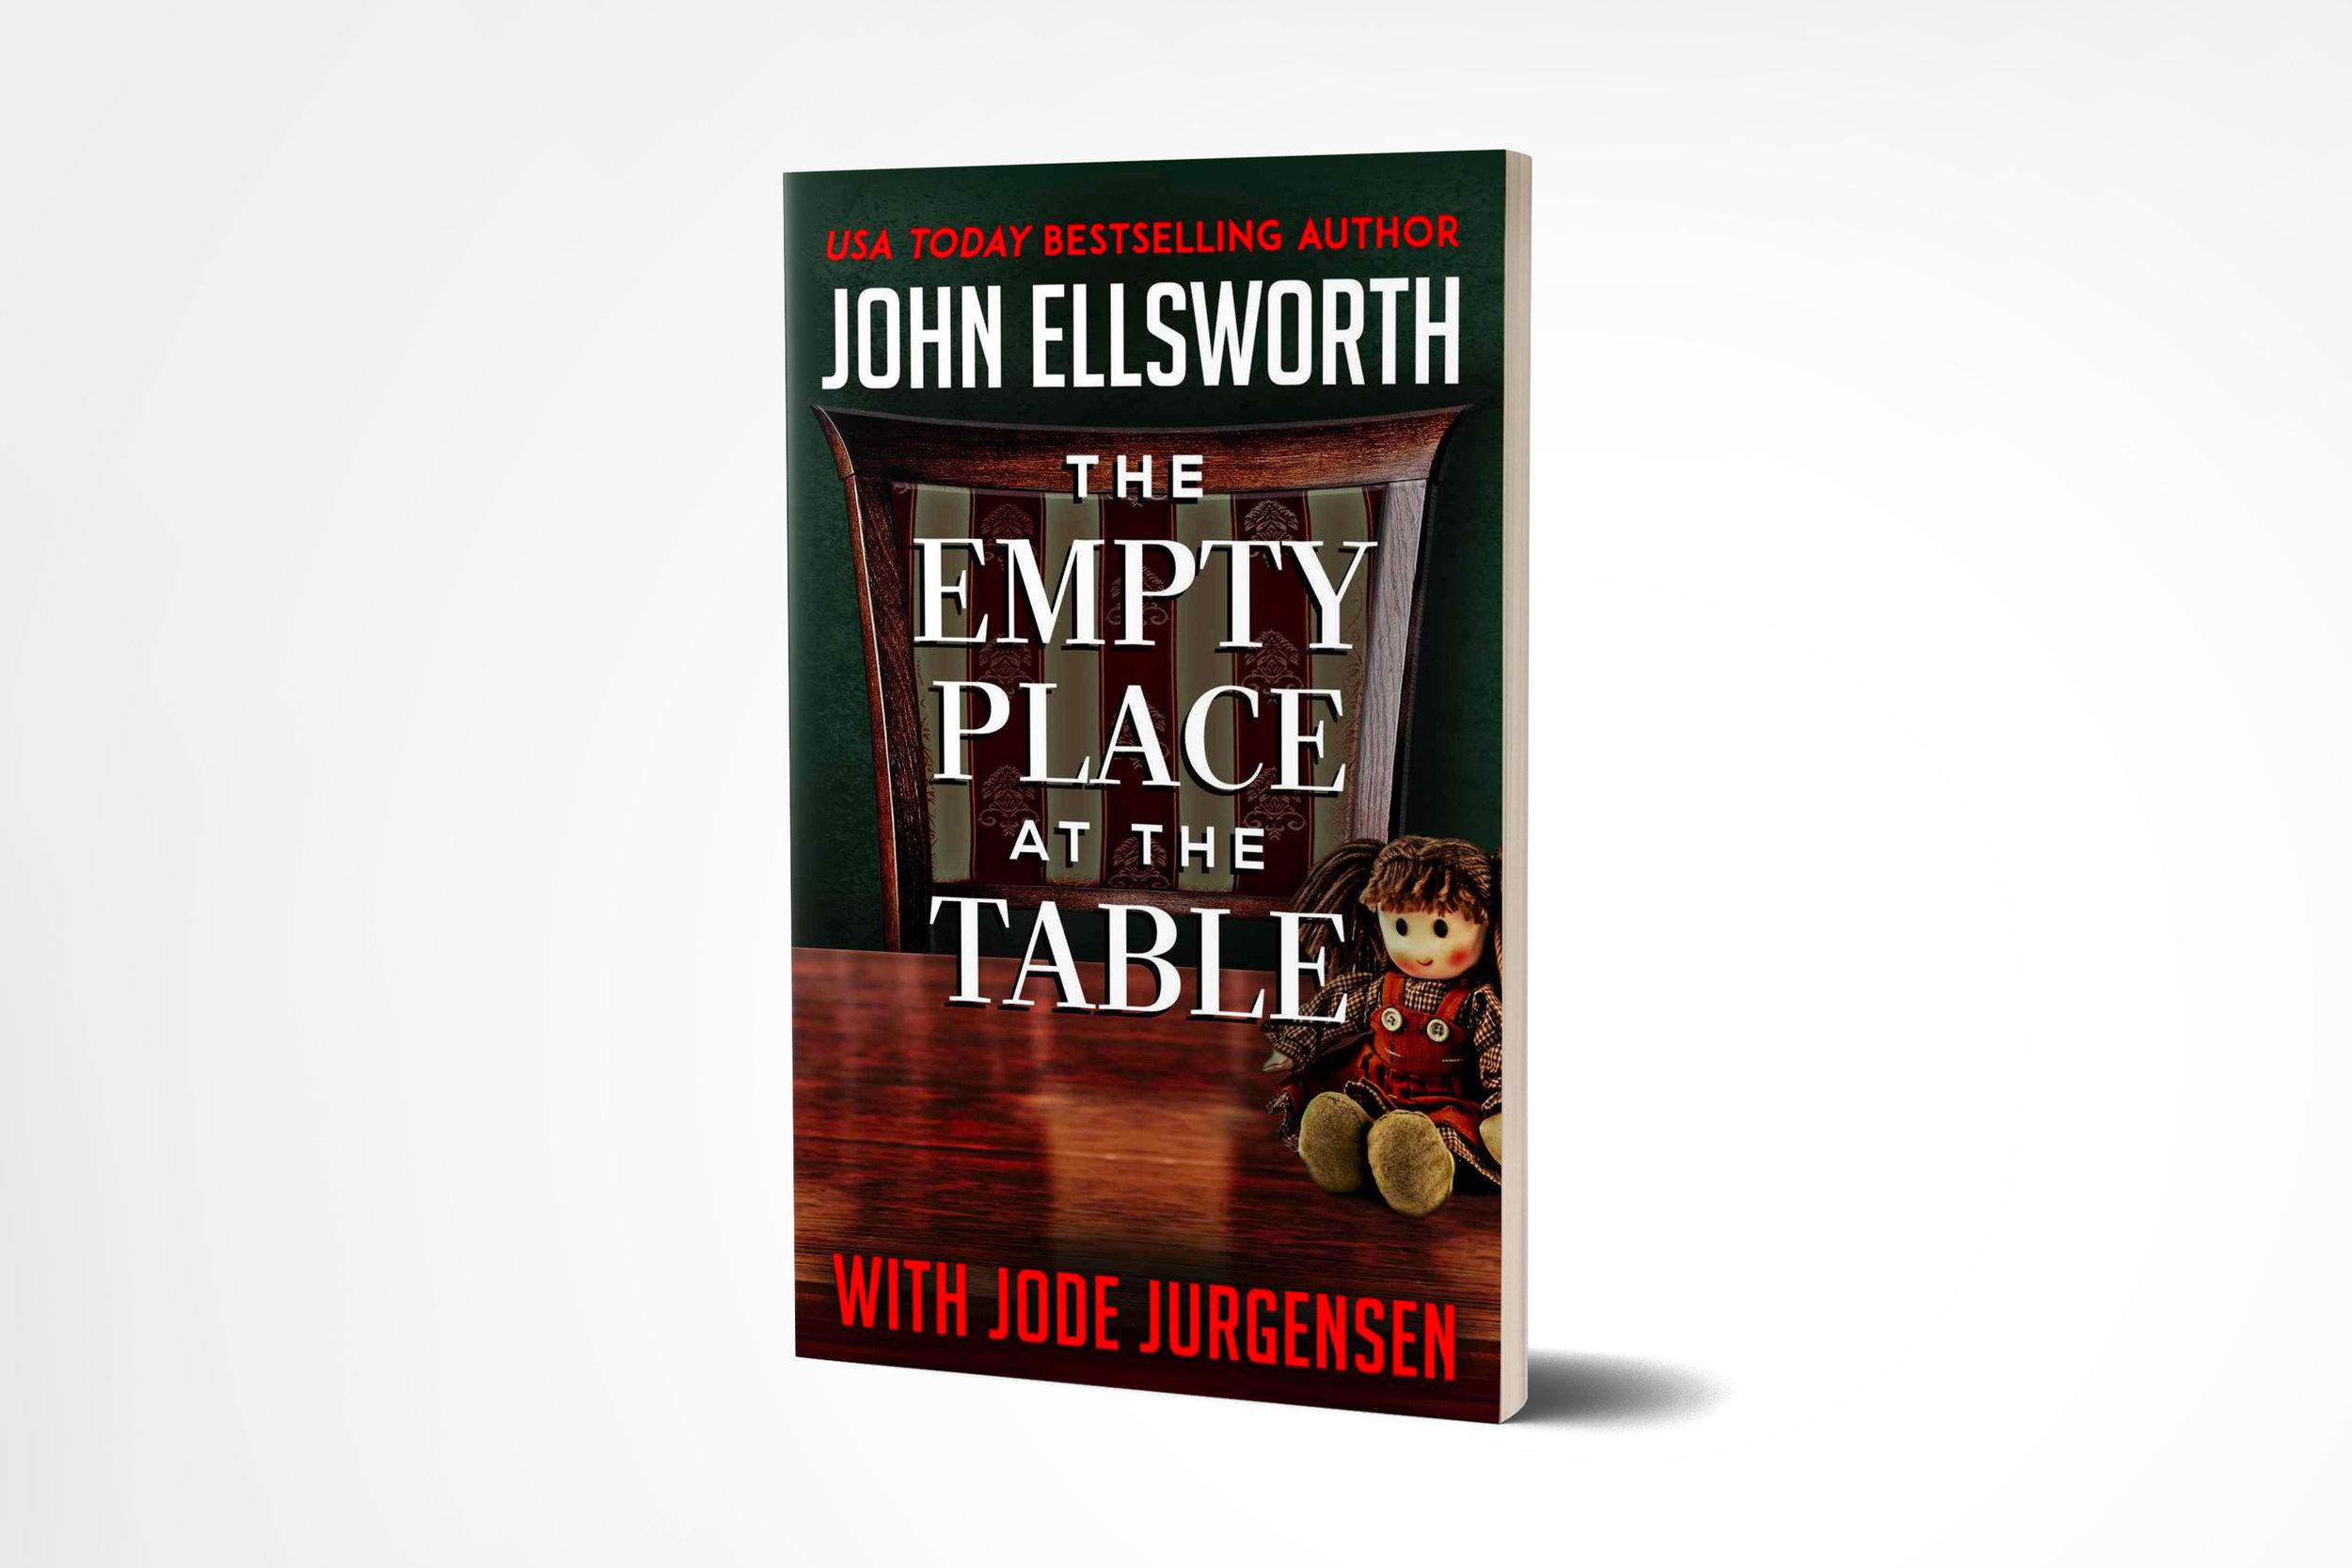 emptyplace_mockup.jpg